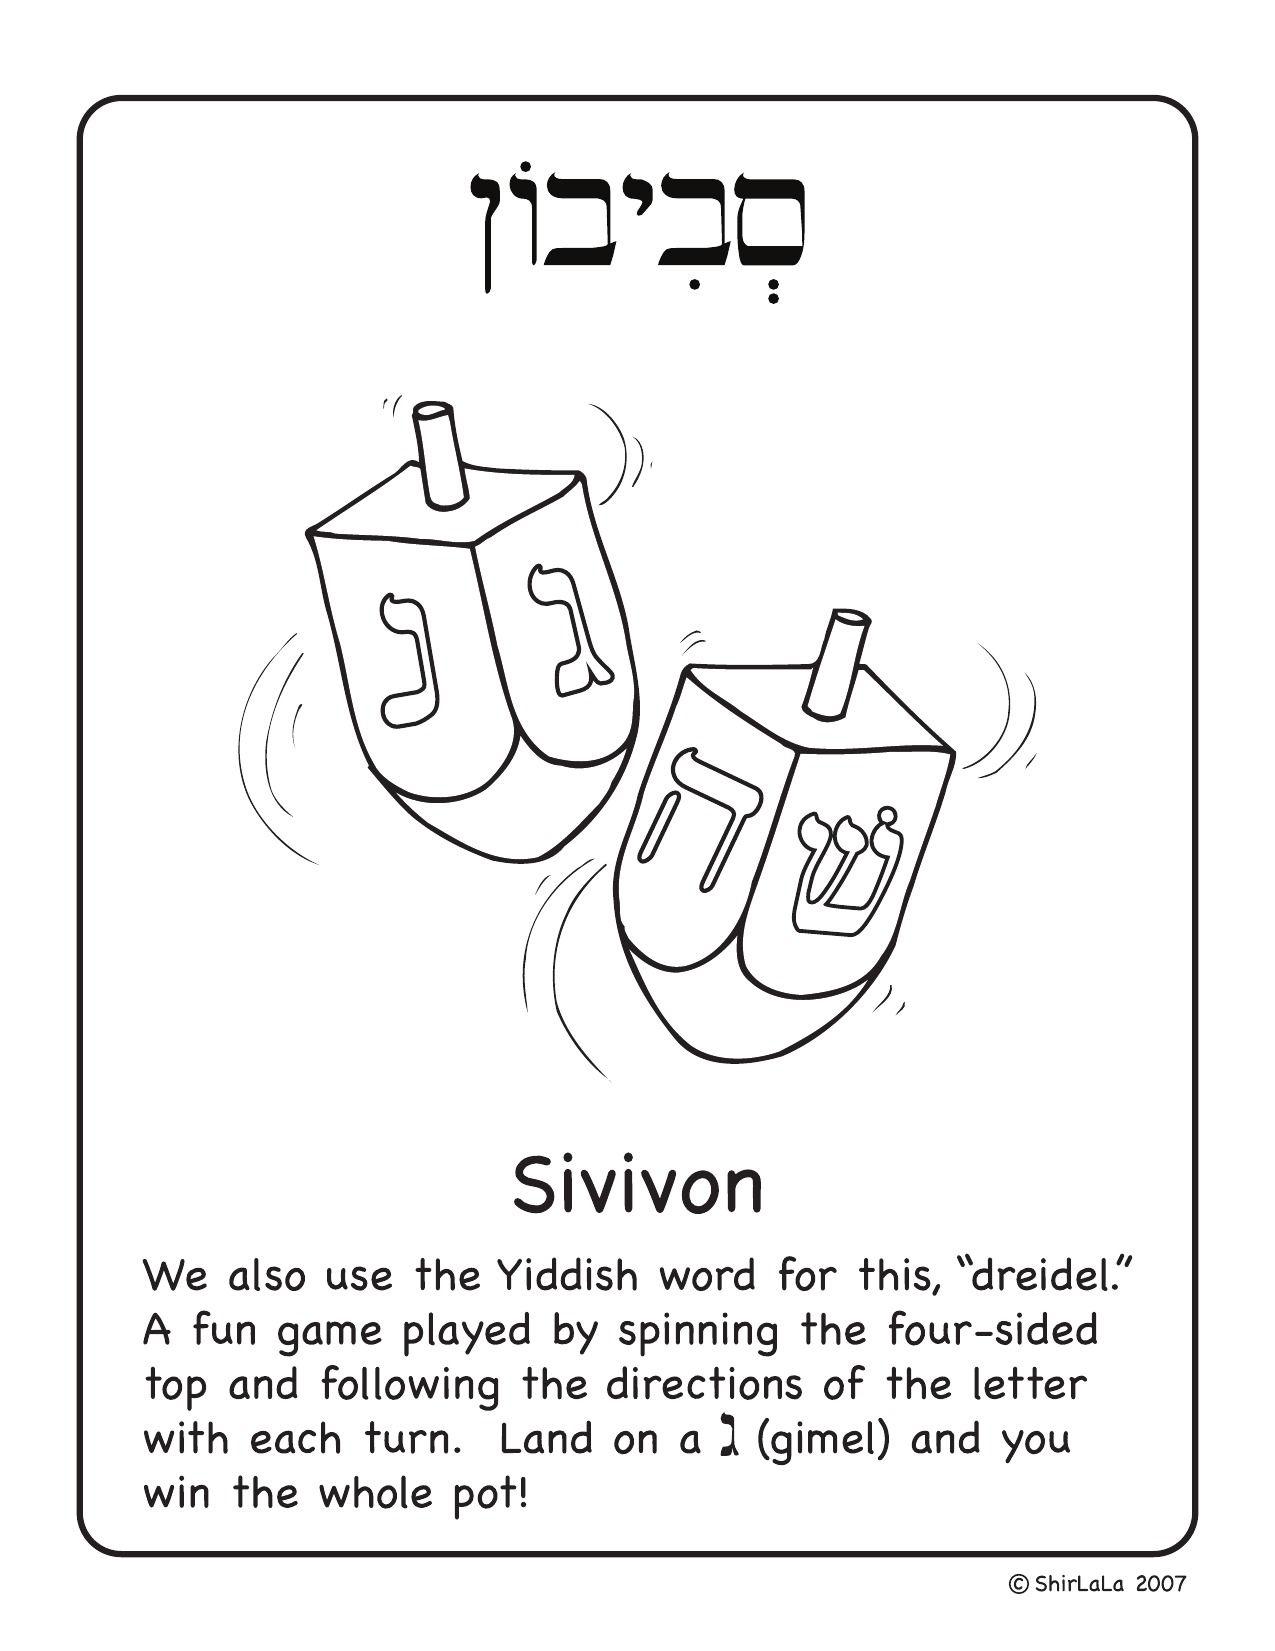 sivivon dreidel hebrew coloring page for chanukah on blog